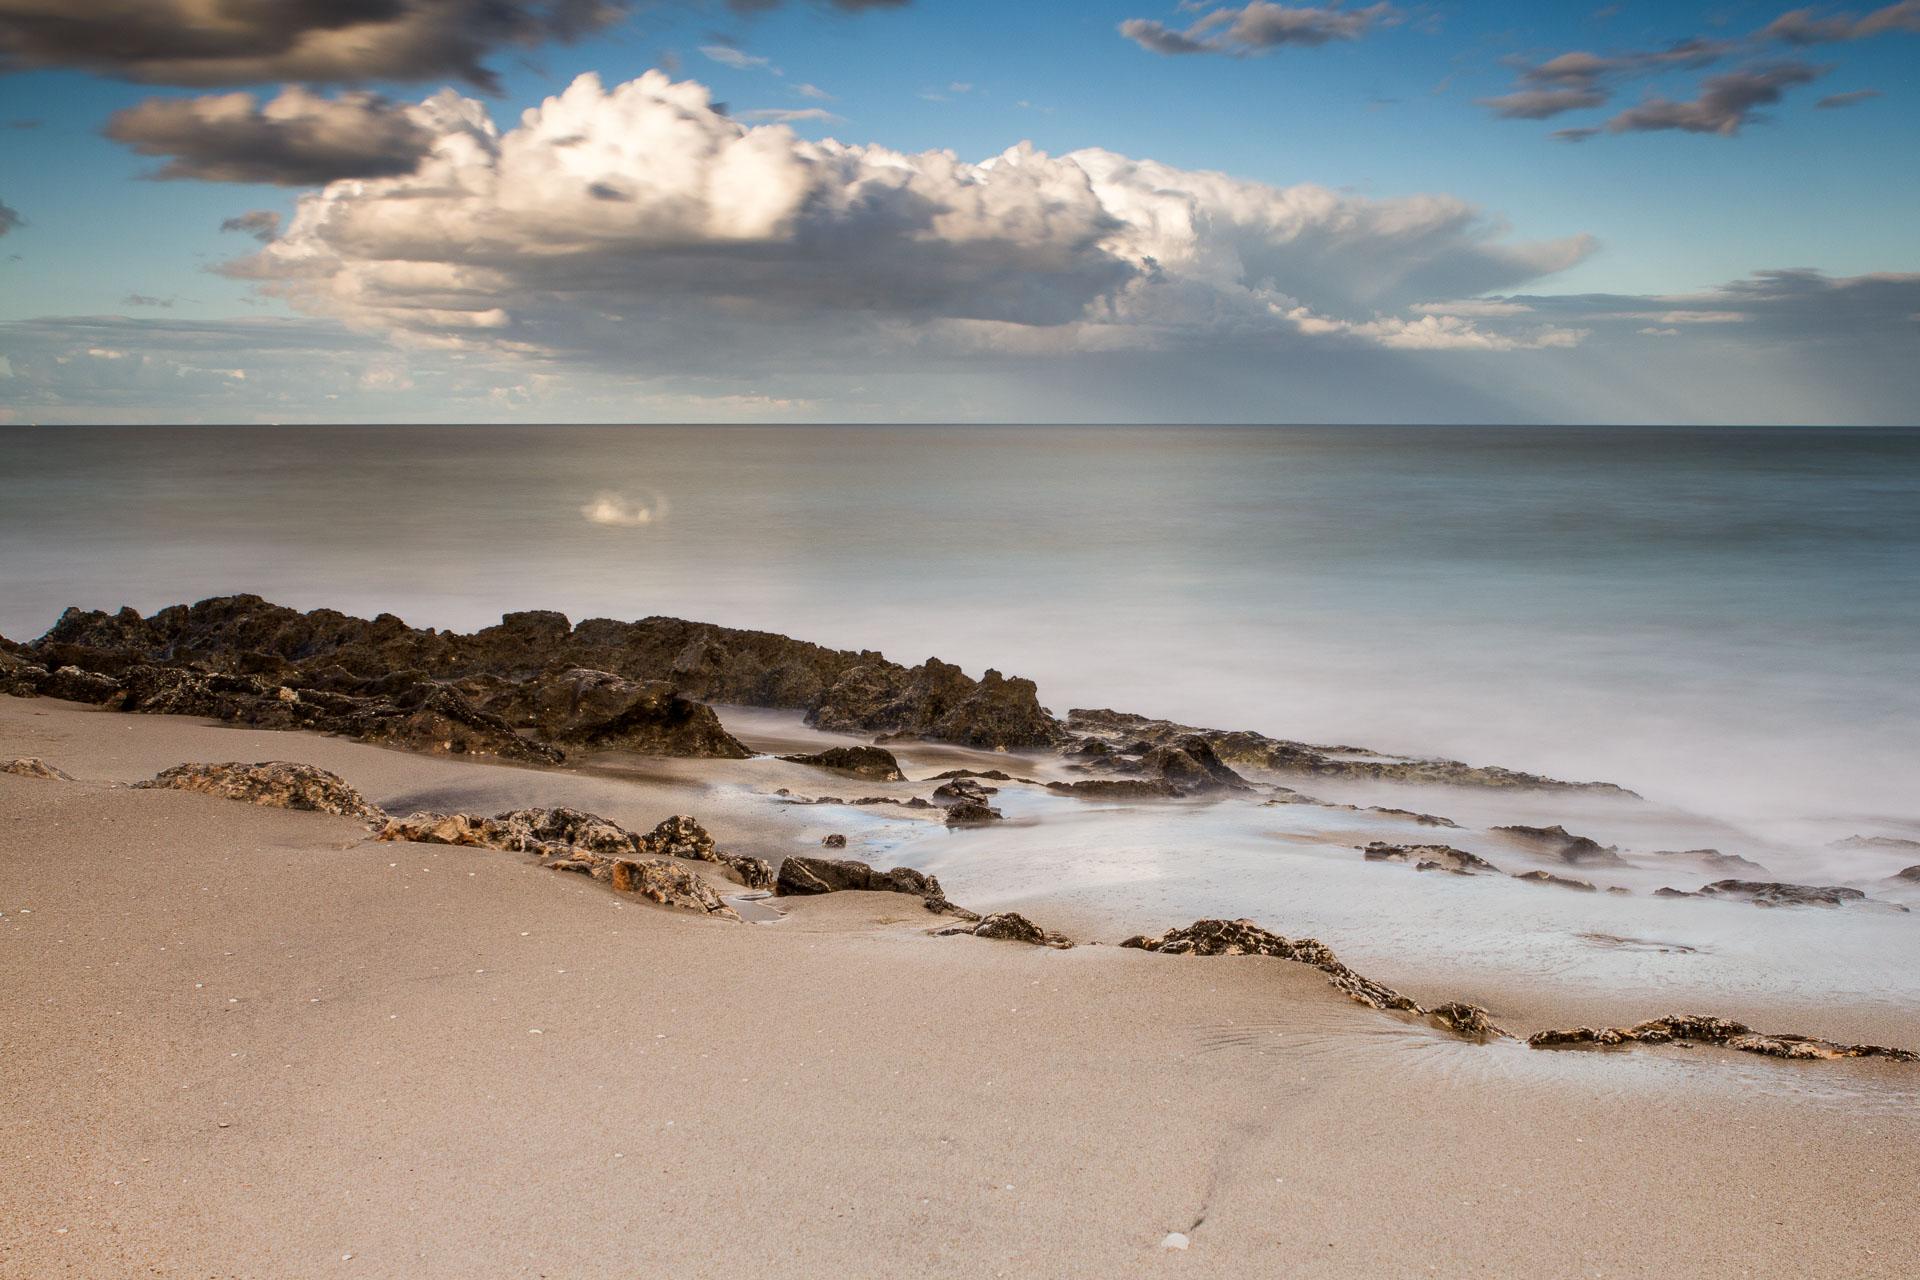 Spiaggia, vento e nuvole, seascape long exposure photography